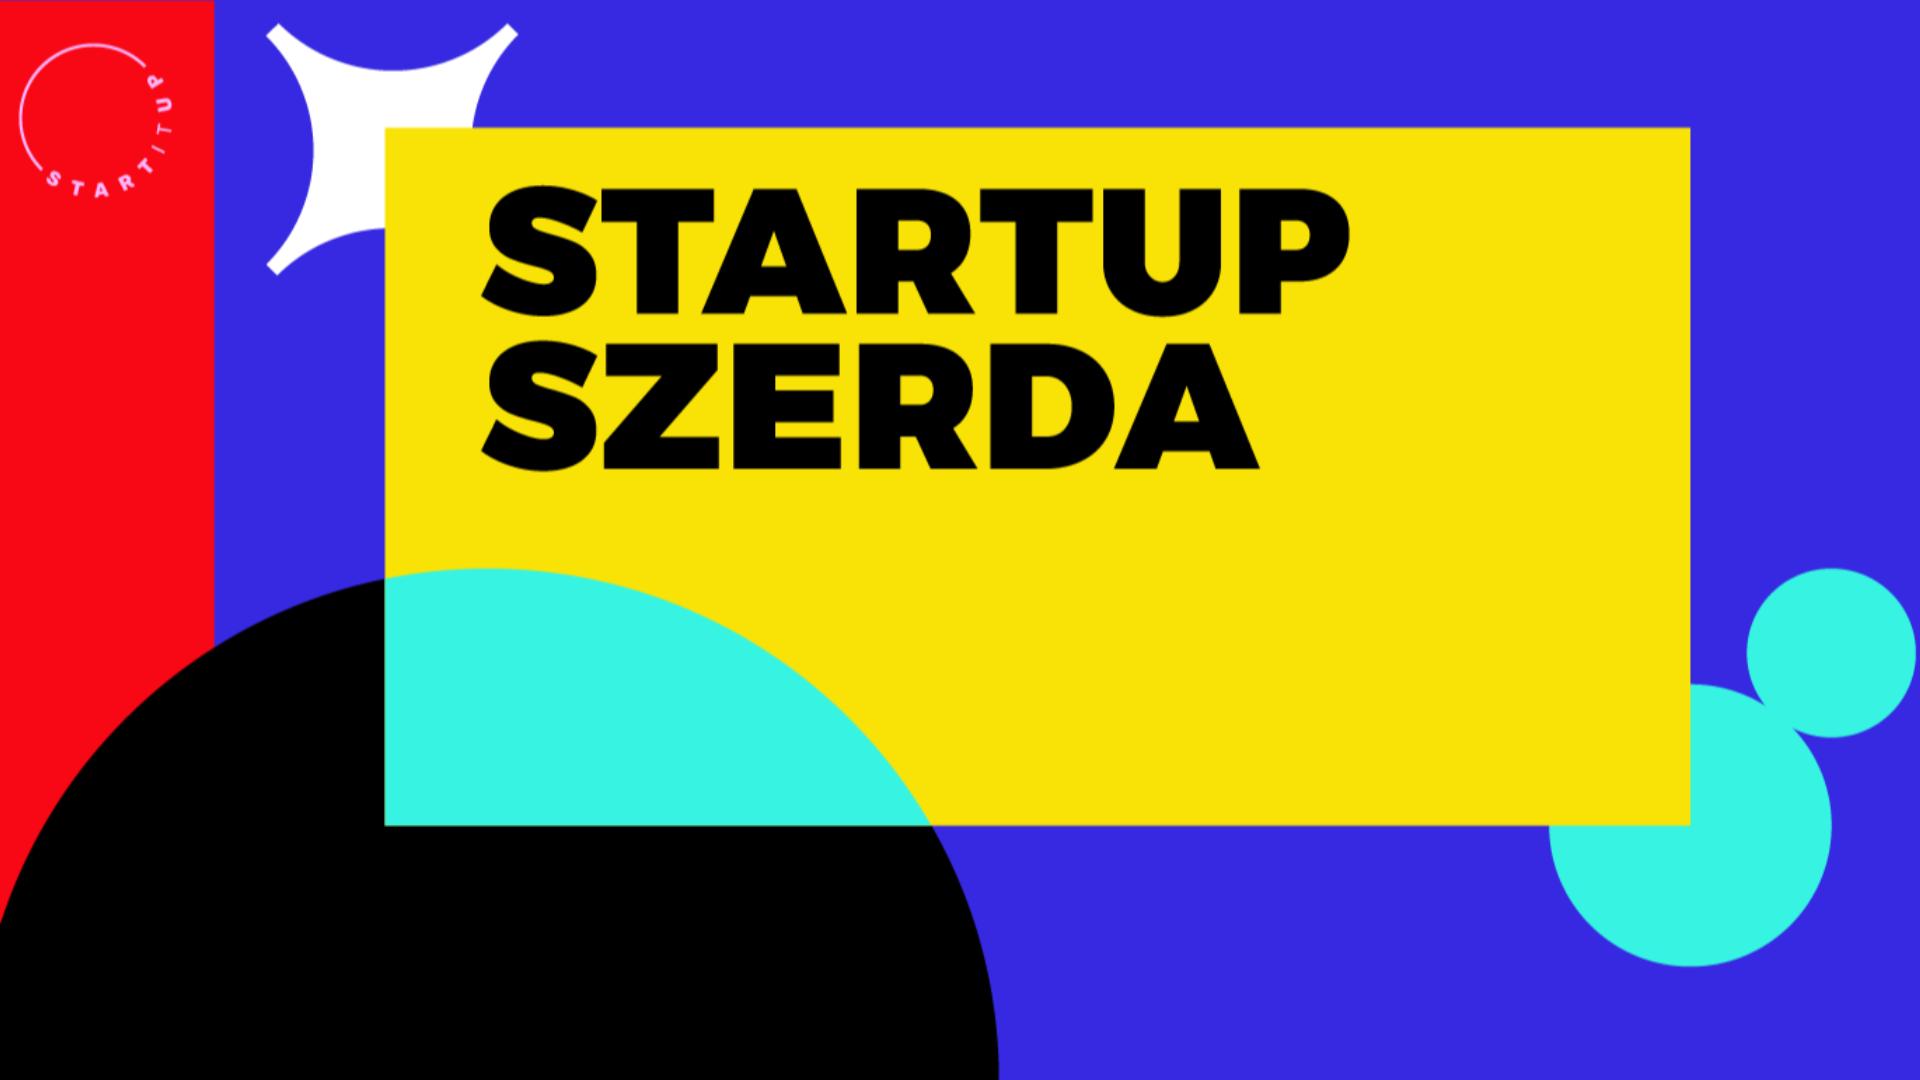 Startup Szerda - Rooftop Party3.0 Mobilis